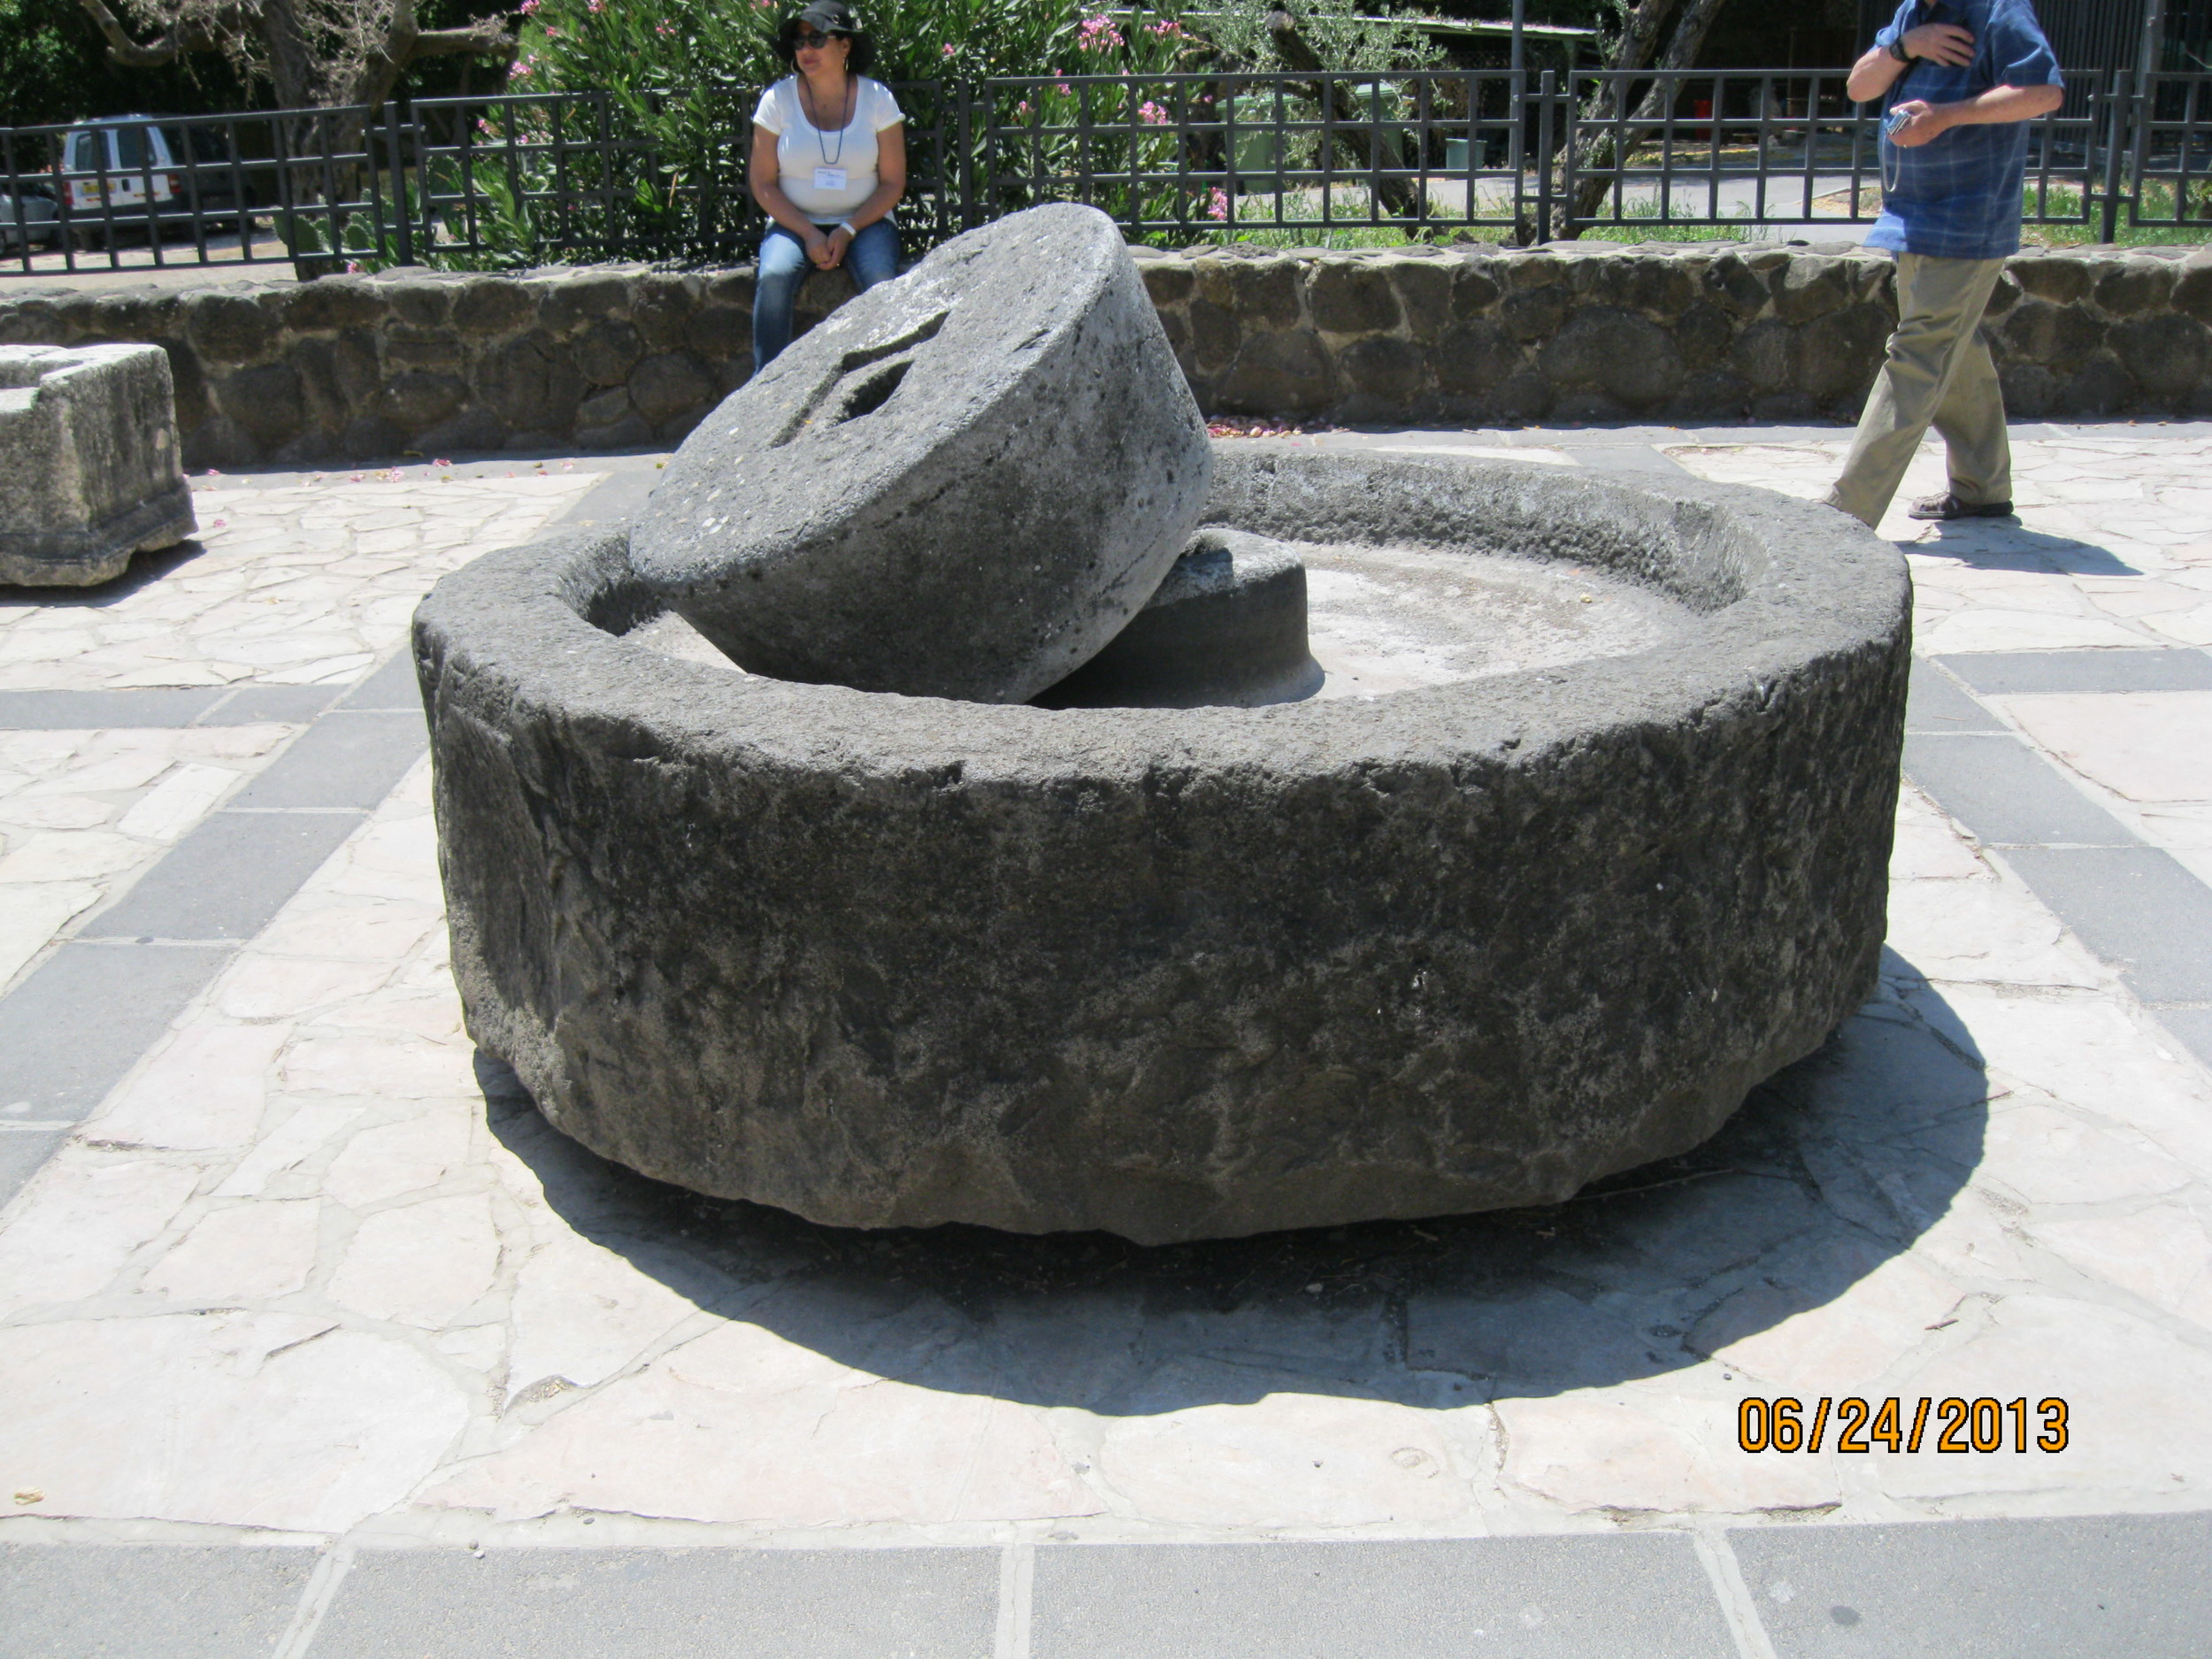 Millstone for making Olive Oil